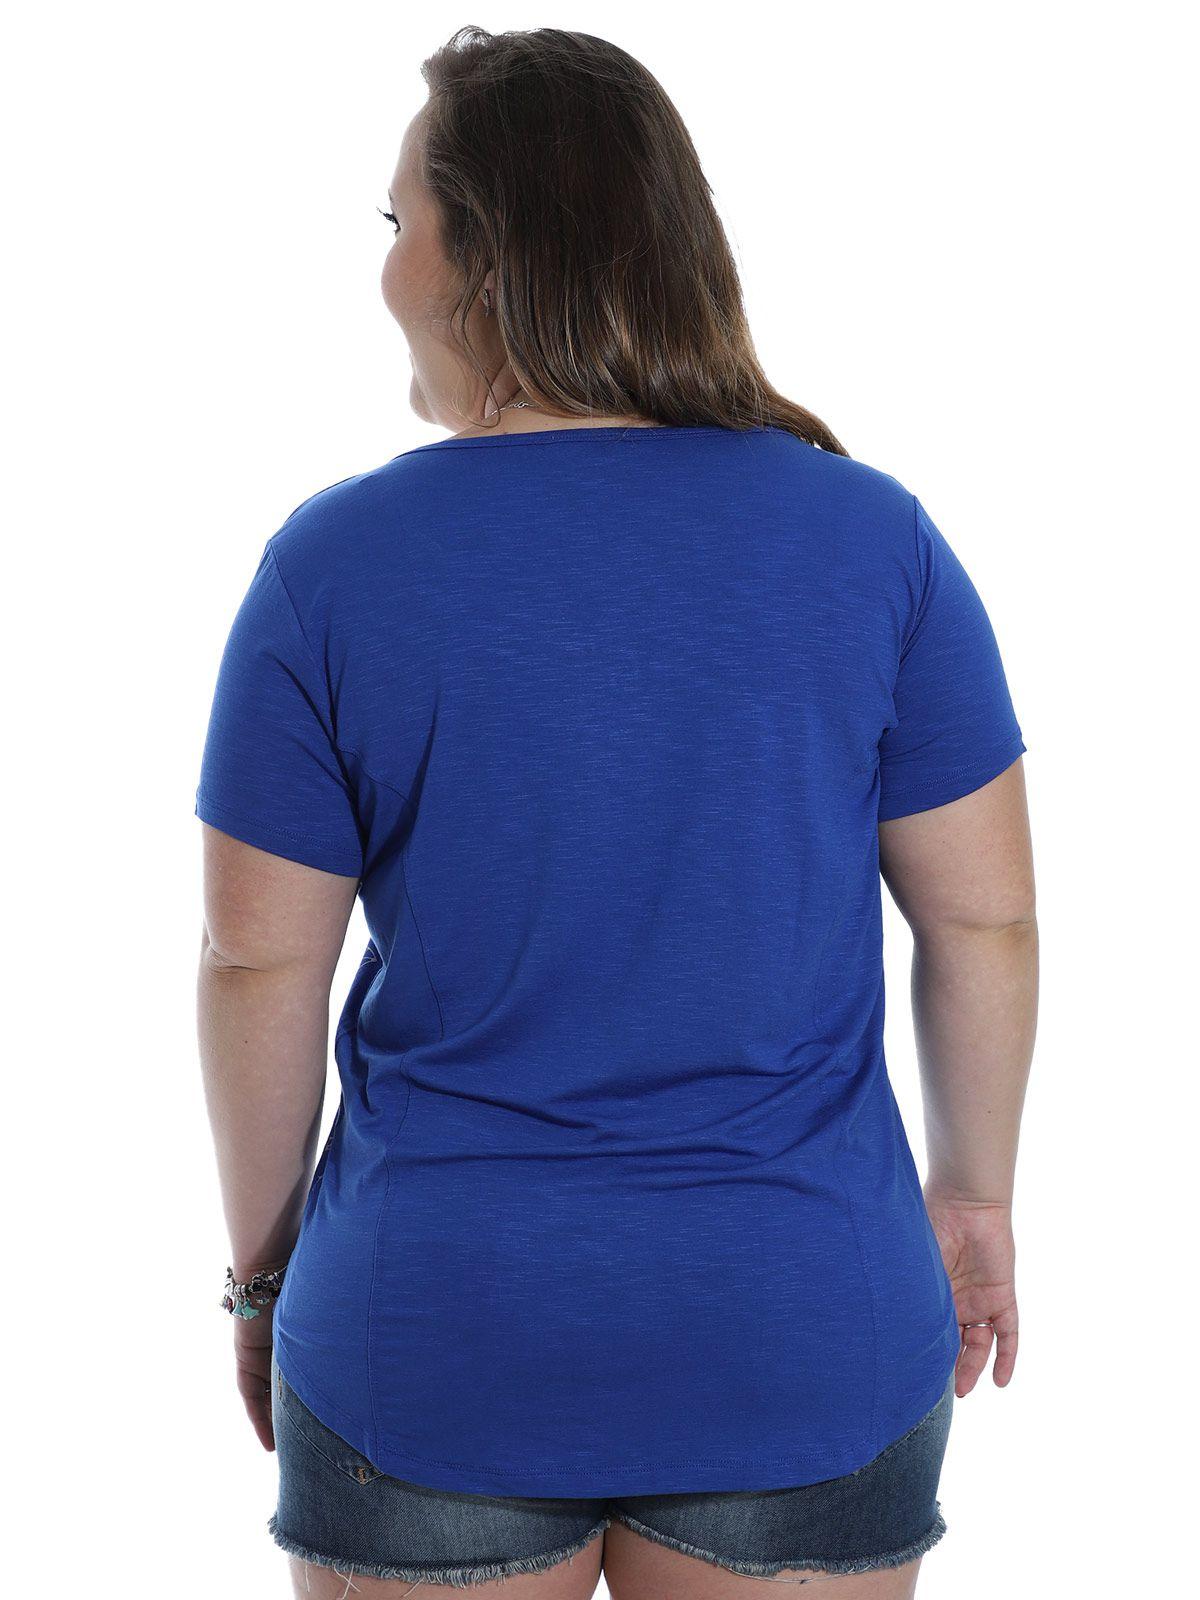 Blusa Plus Size KTS Decote V. com Estampa Bic